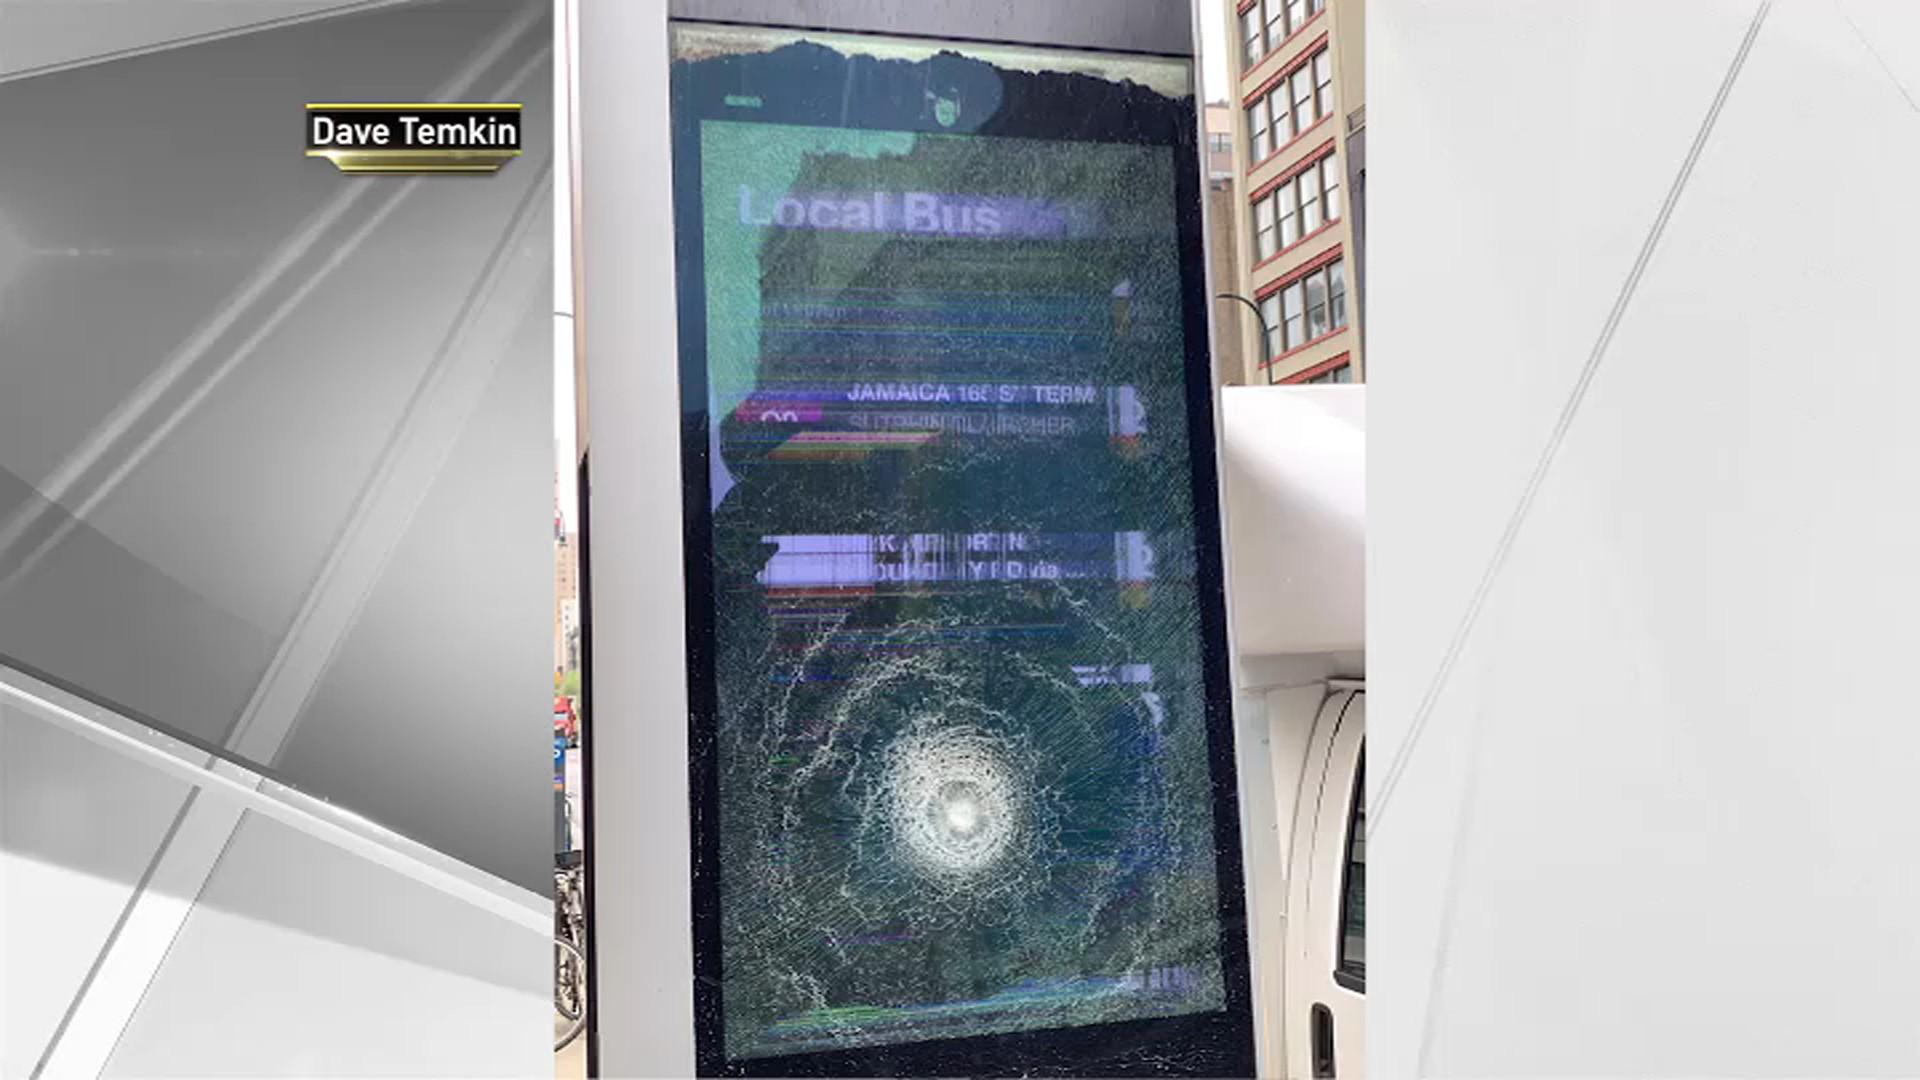 Vandal Smashes 30 LinkNYC Kiosk Screens, Spokesperson Says